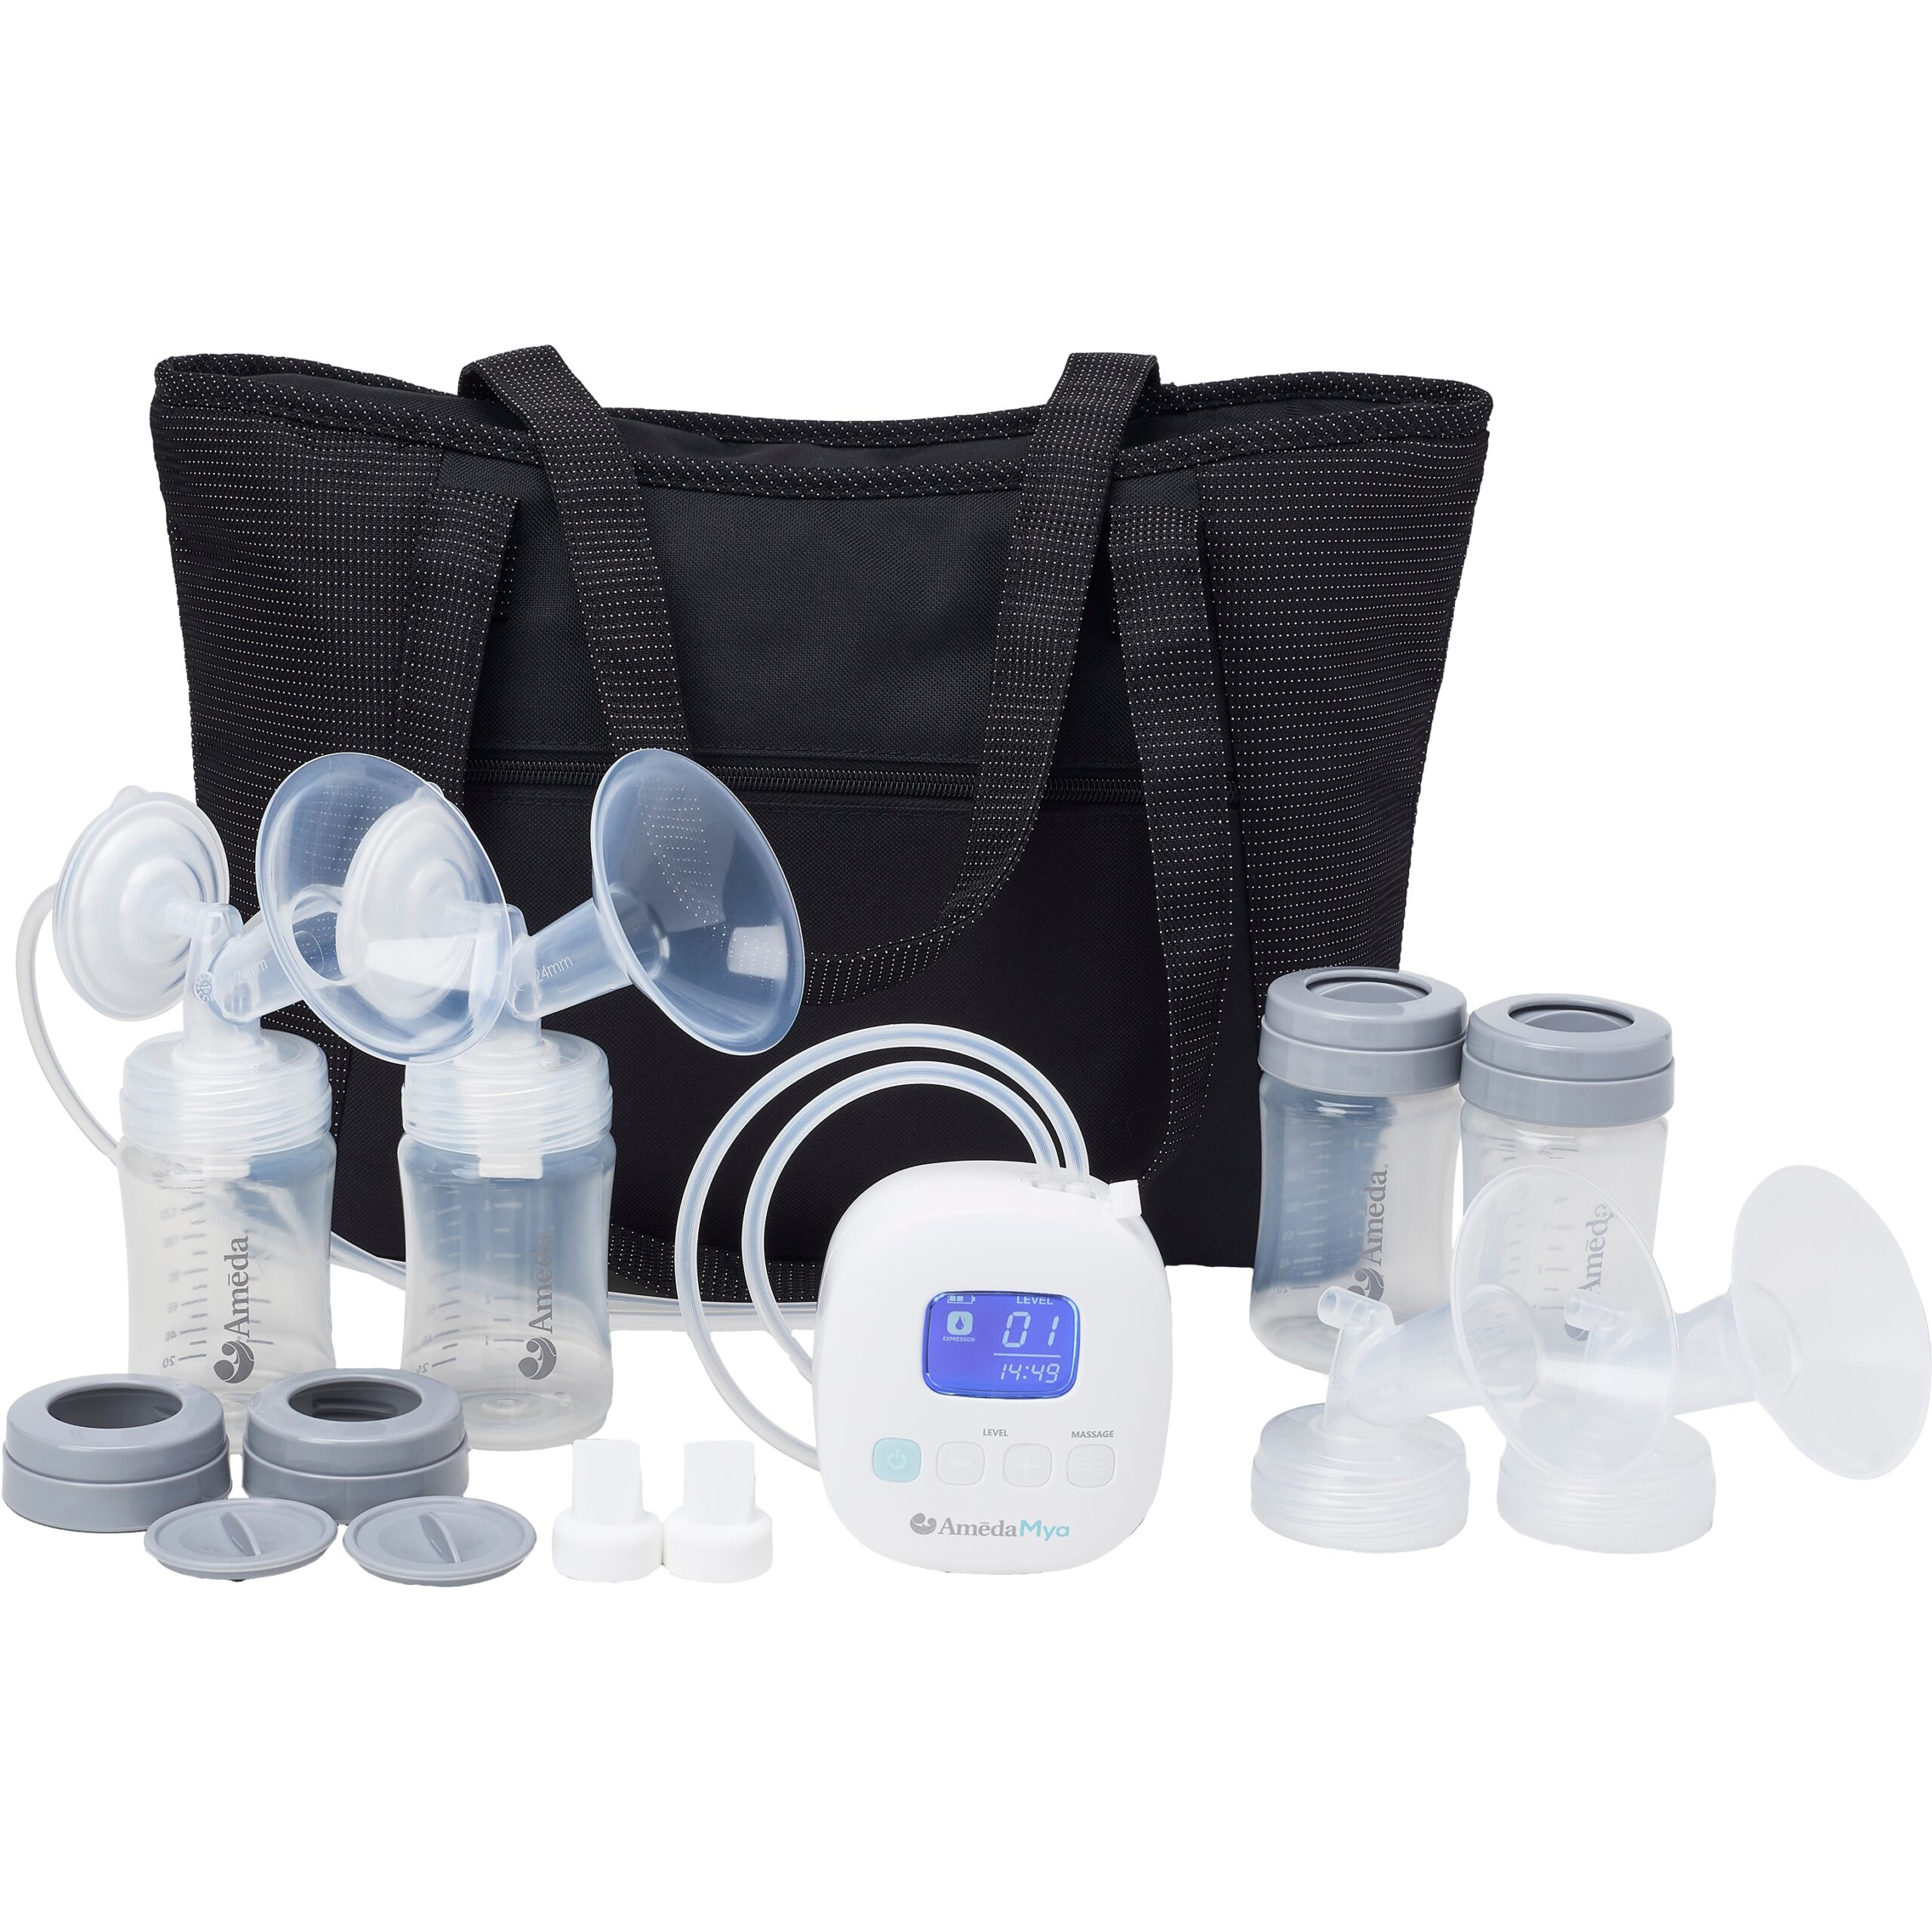 Ameda Mya breast pump with large tote bag